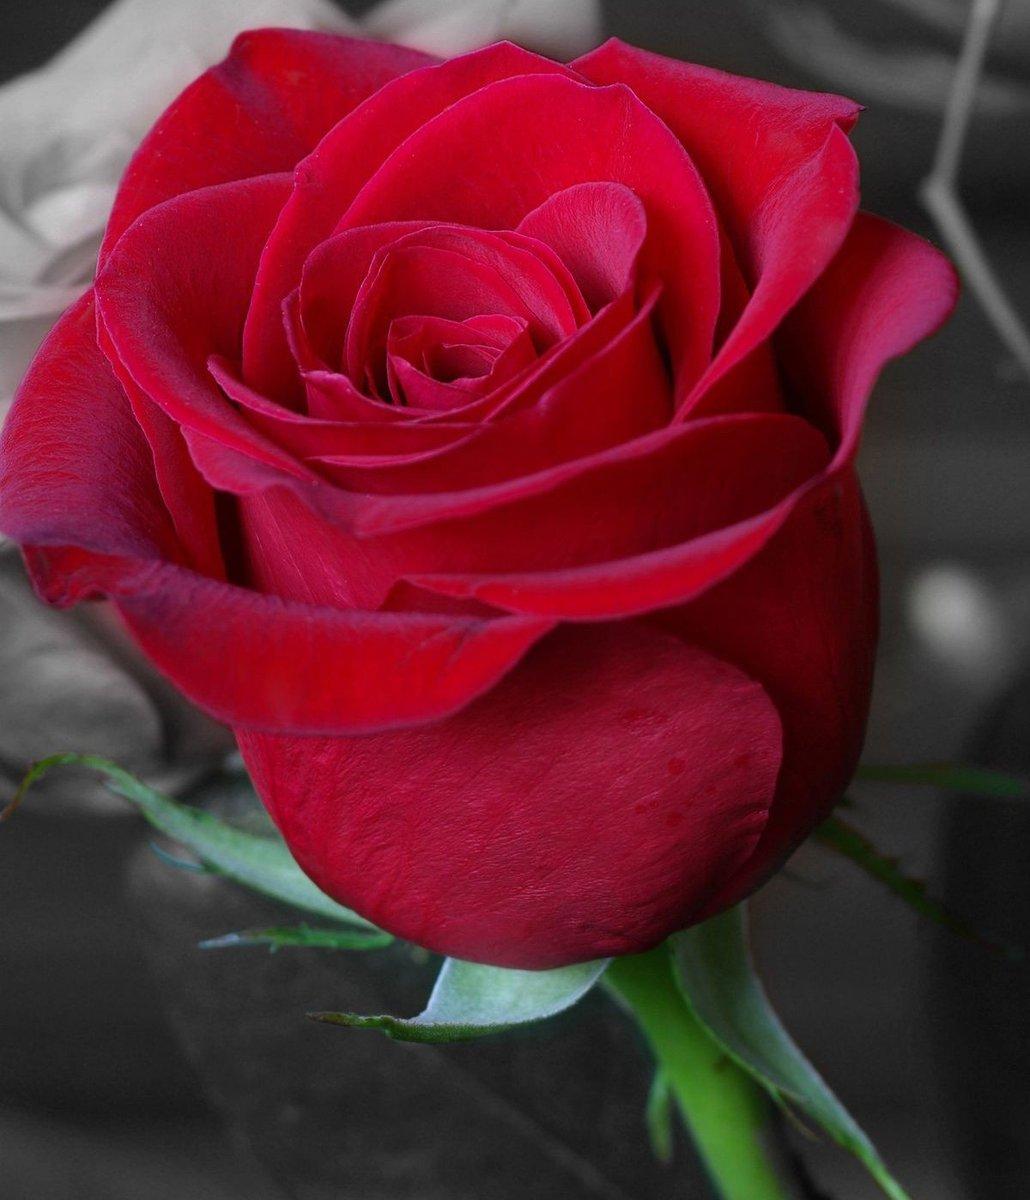 Happy Friday to everyone #FridayMorning #FridayMotivation #FridayFeeling #love #rose   <br>http://pic.twitter.com/0Fgzdj19XA